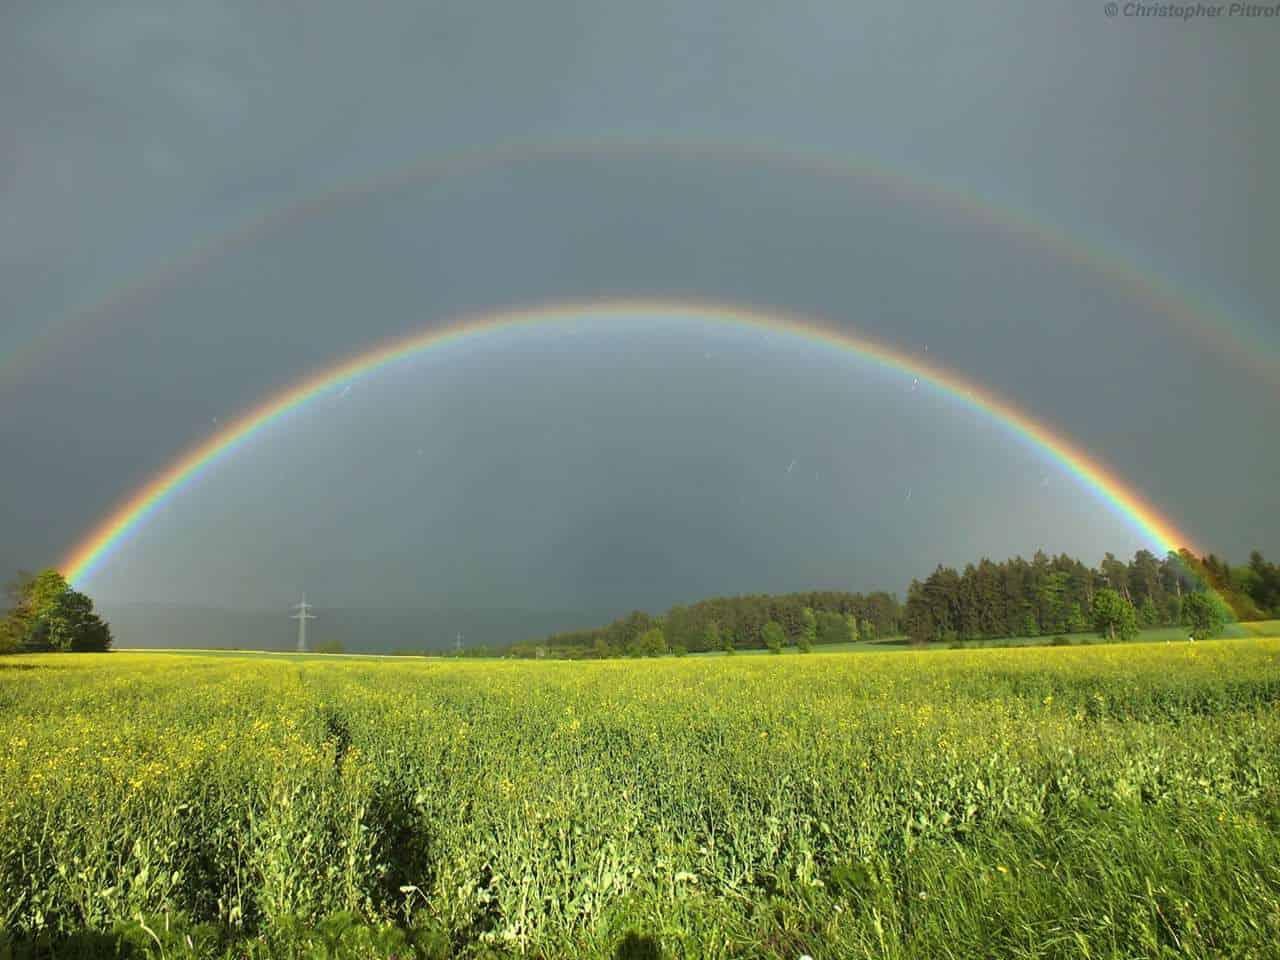 Intense double rainbow after a strong rainshower